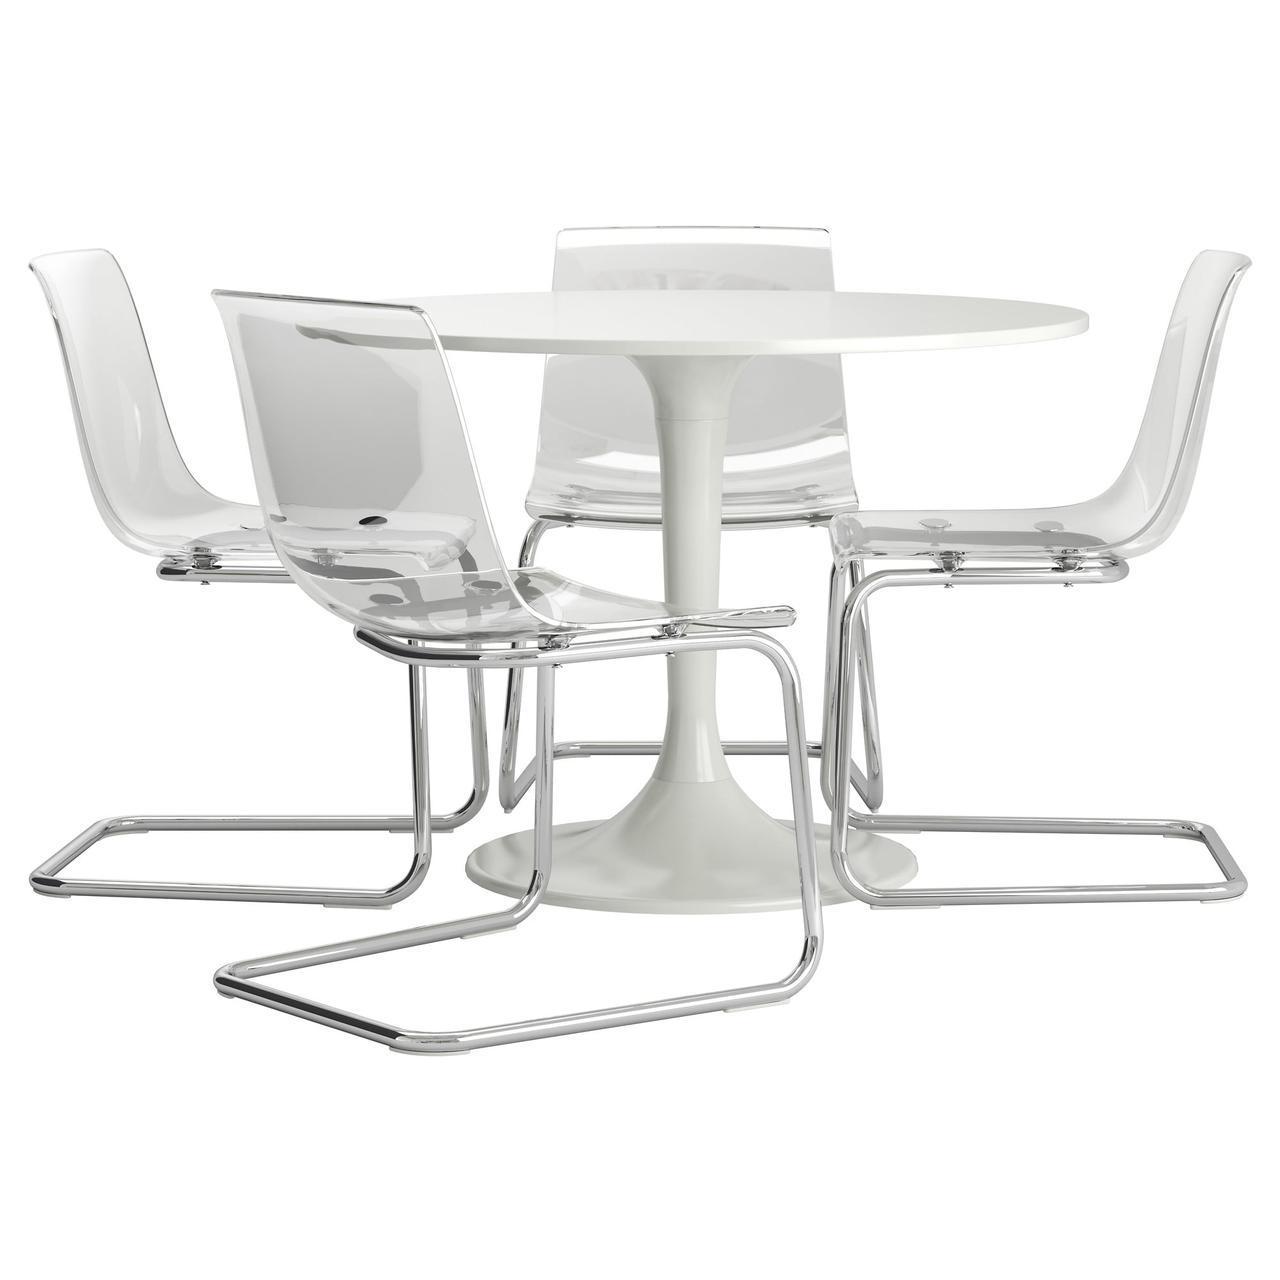 IKEA DOCKSTA / TOBIAS (992.298.00) Стол и 4 стула, прозрачный